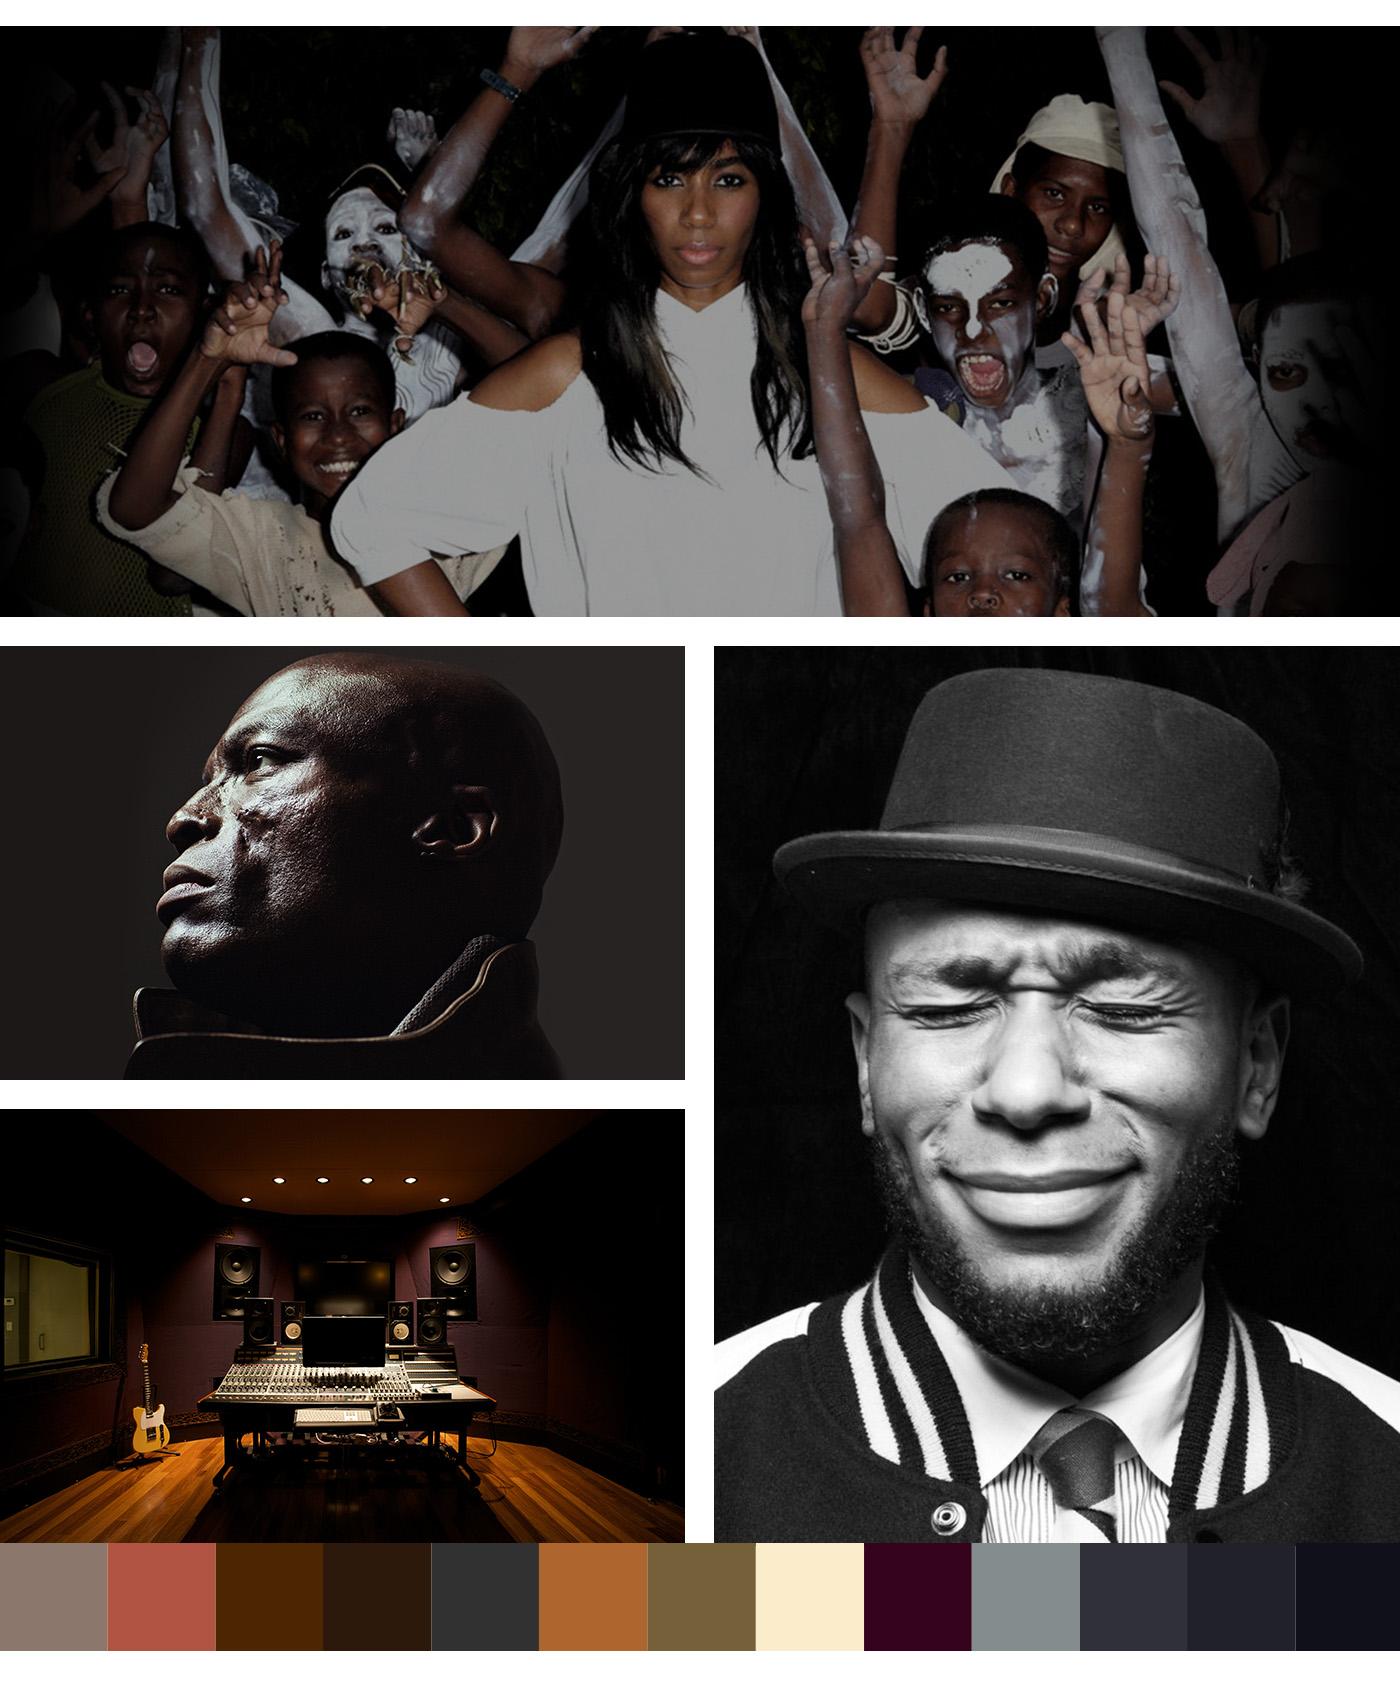 zmaic-downtown-music-publishing-dmp_branding-art-direction-photo-curation-deep-dark-color-palette.jpg